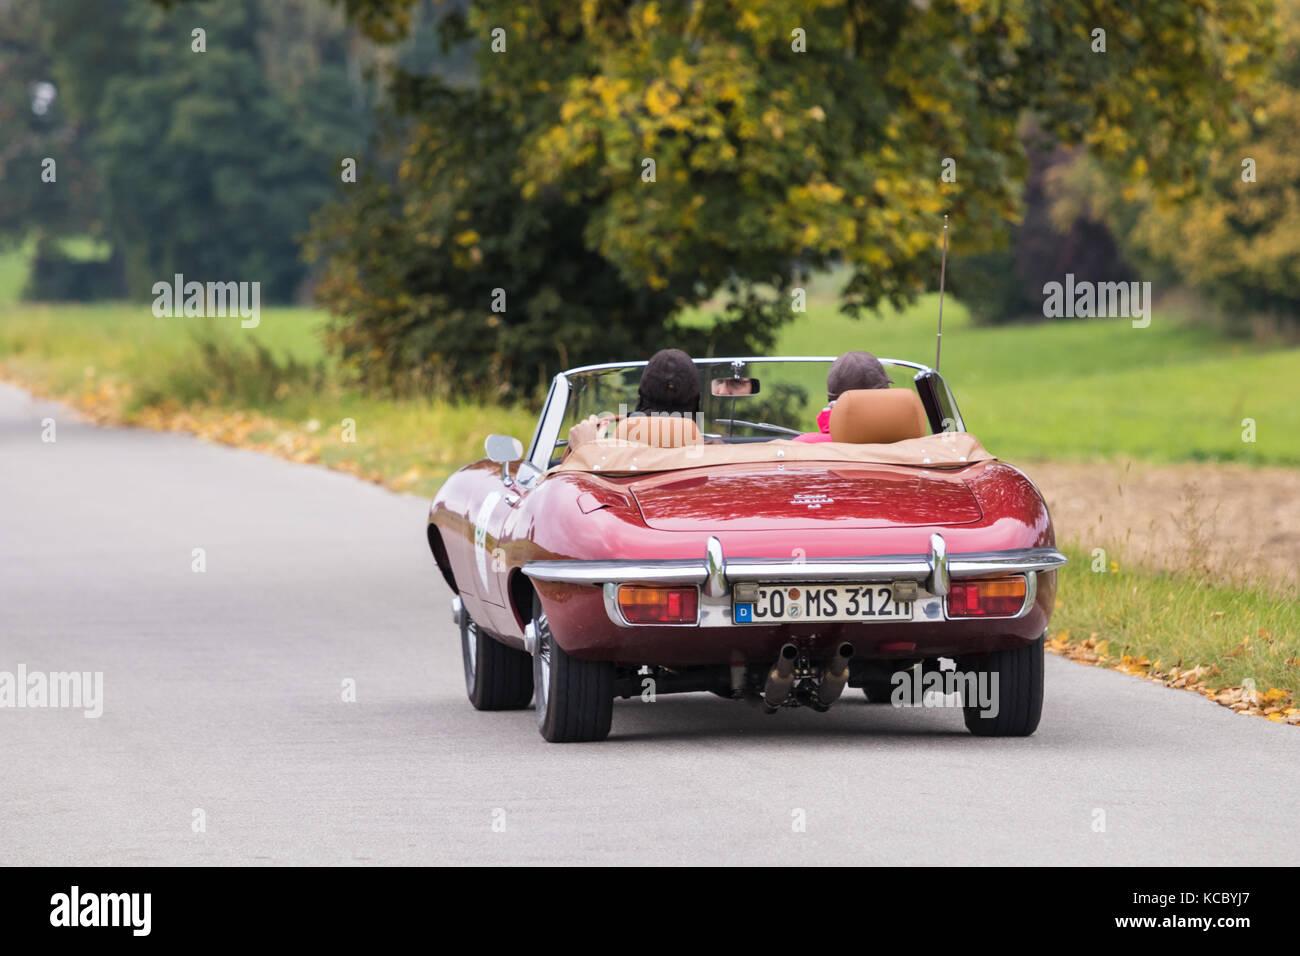 Augsburg, Germany - October 1, 2017: Jaguar E-Type oldtimer car at the Fuggerstadt Classic 2017 Oldtimer Rallye - Stock Image